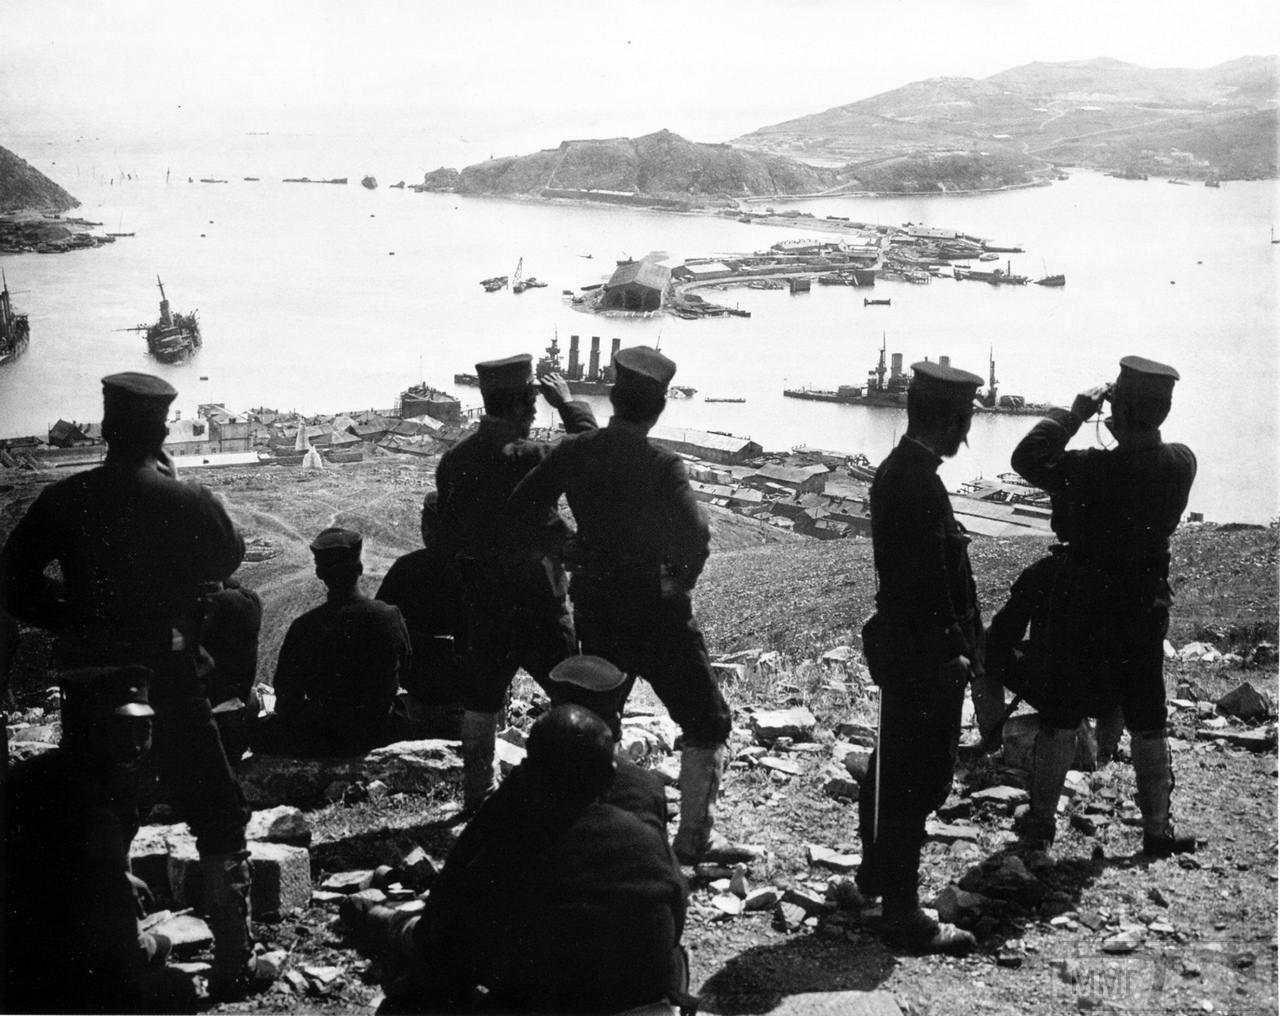 103945 - Оборона Порт-Артура